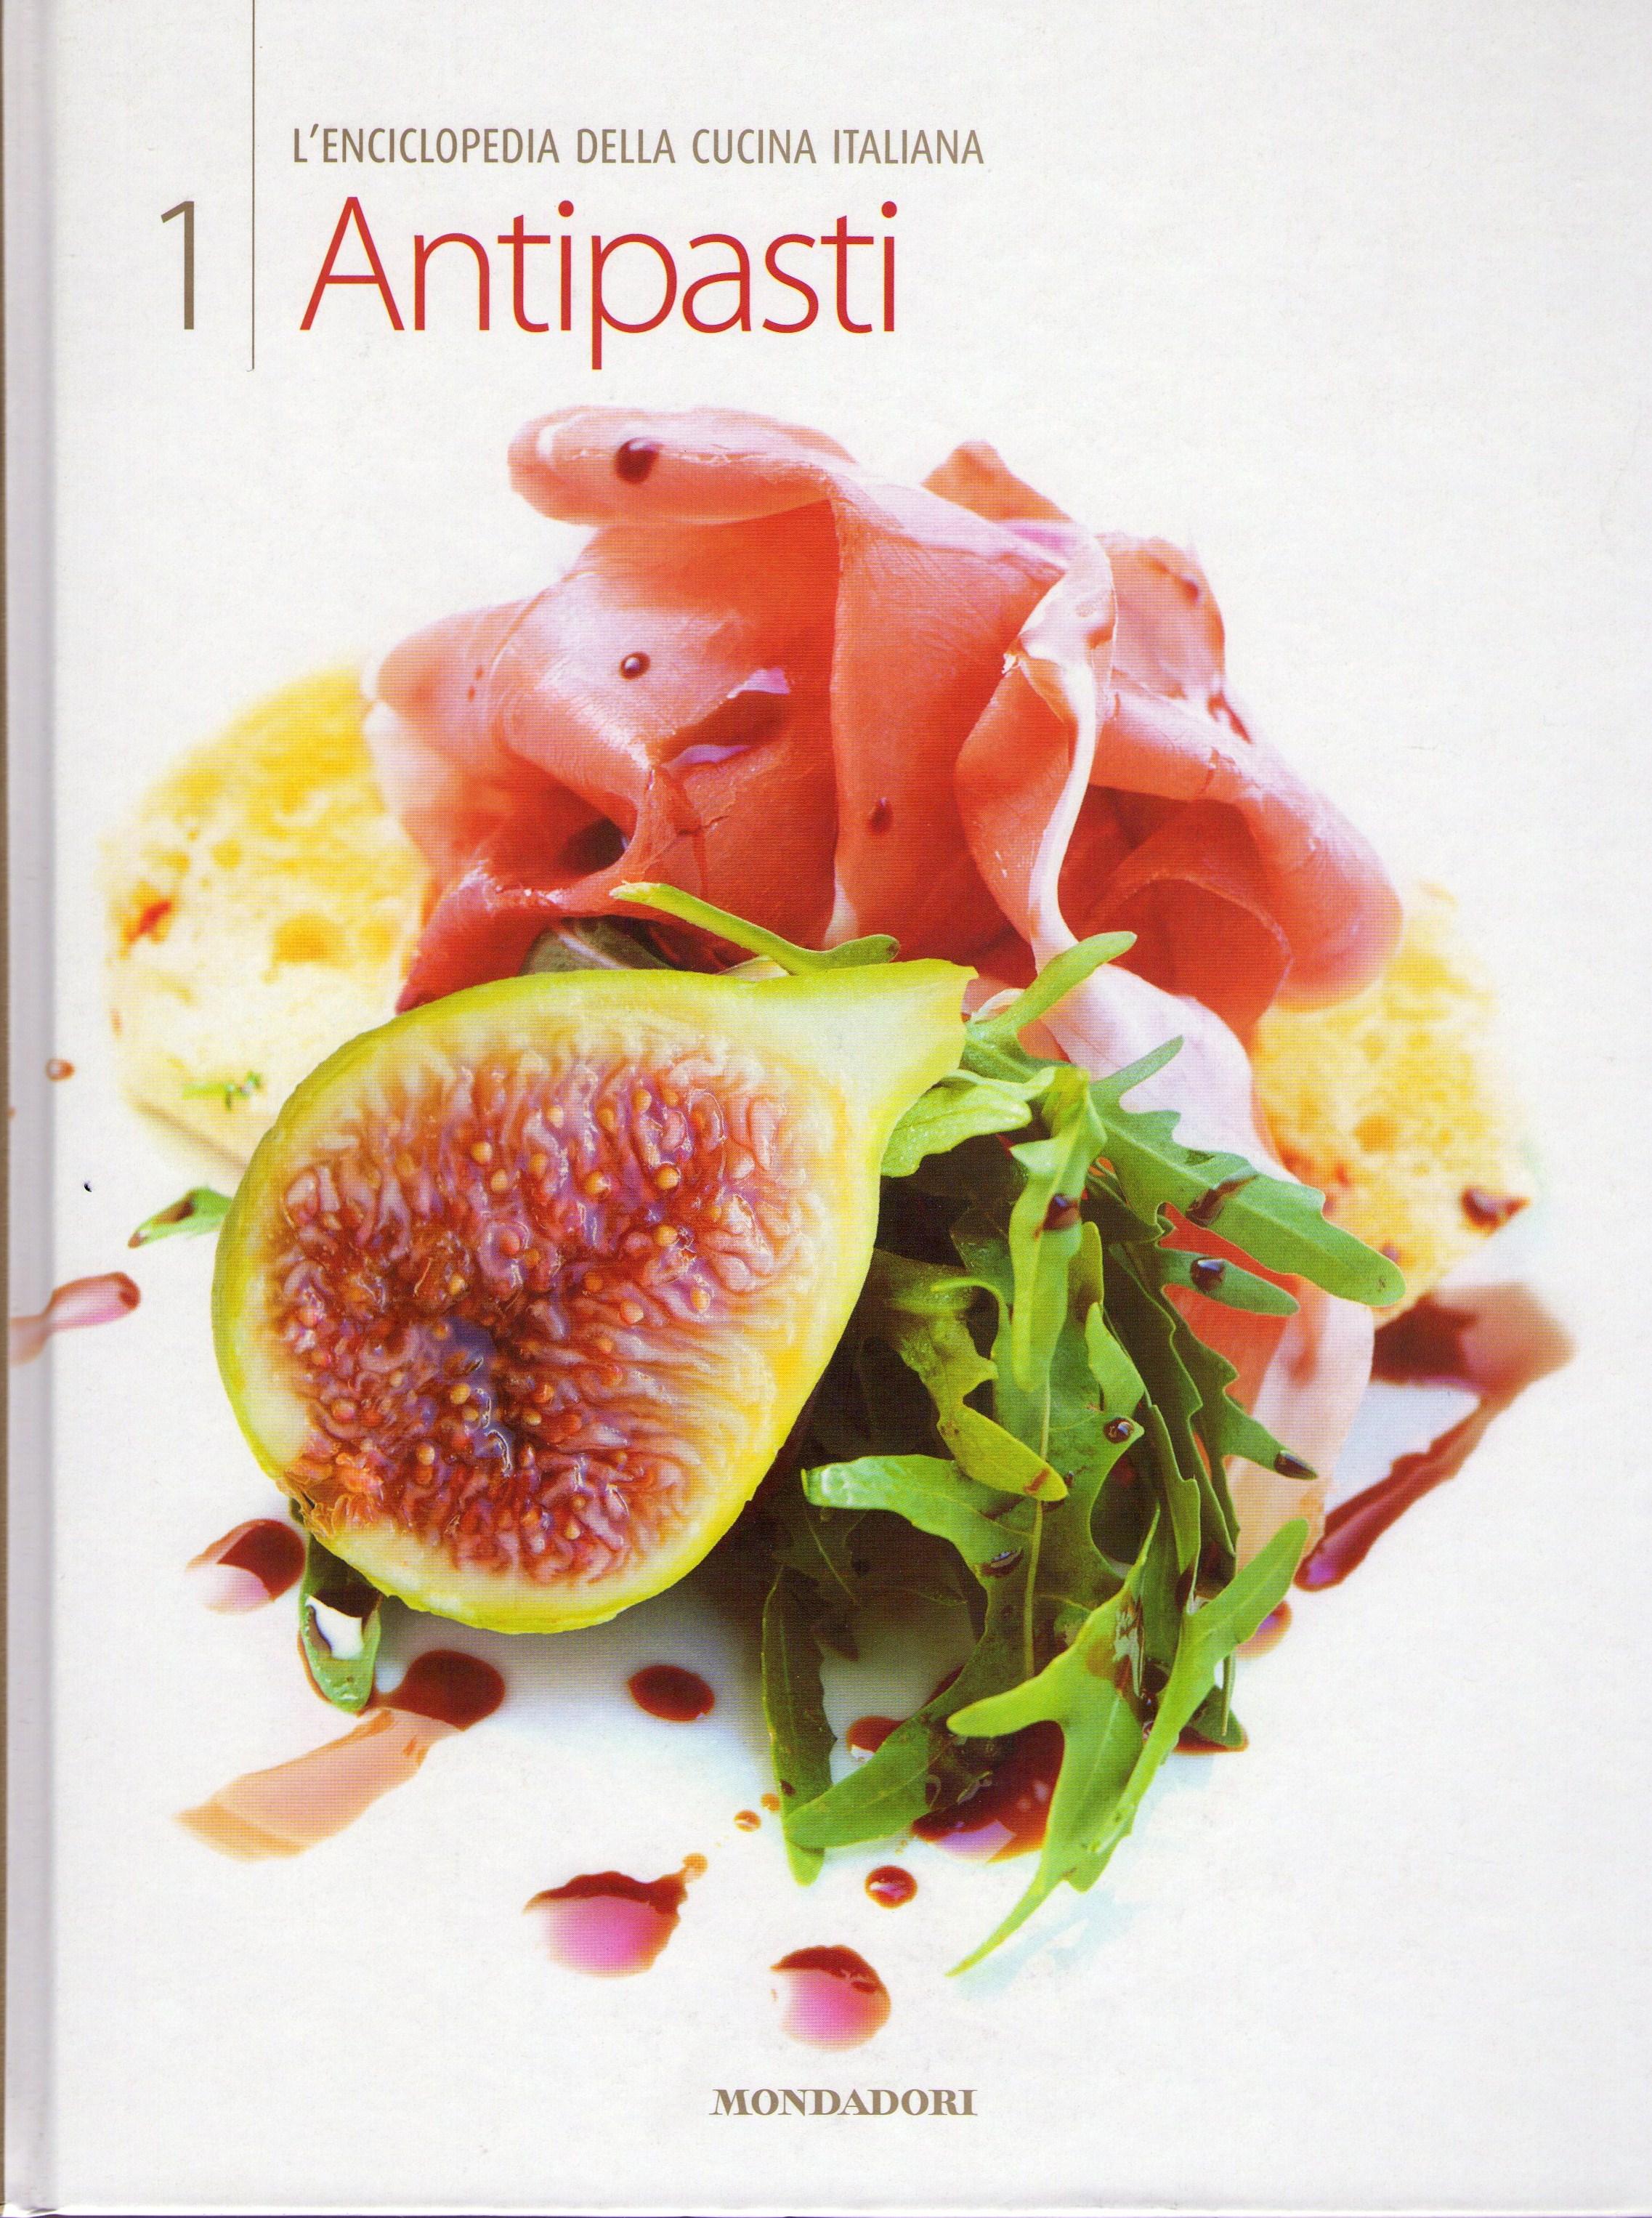 L'enciclopedia della cucina italiana